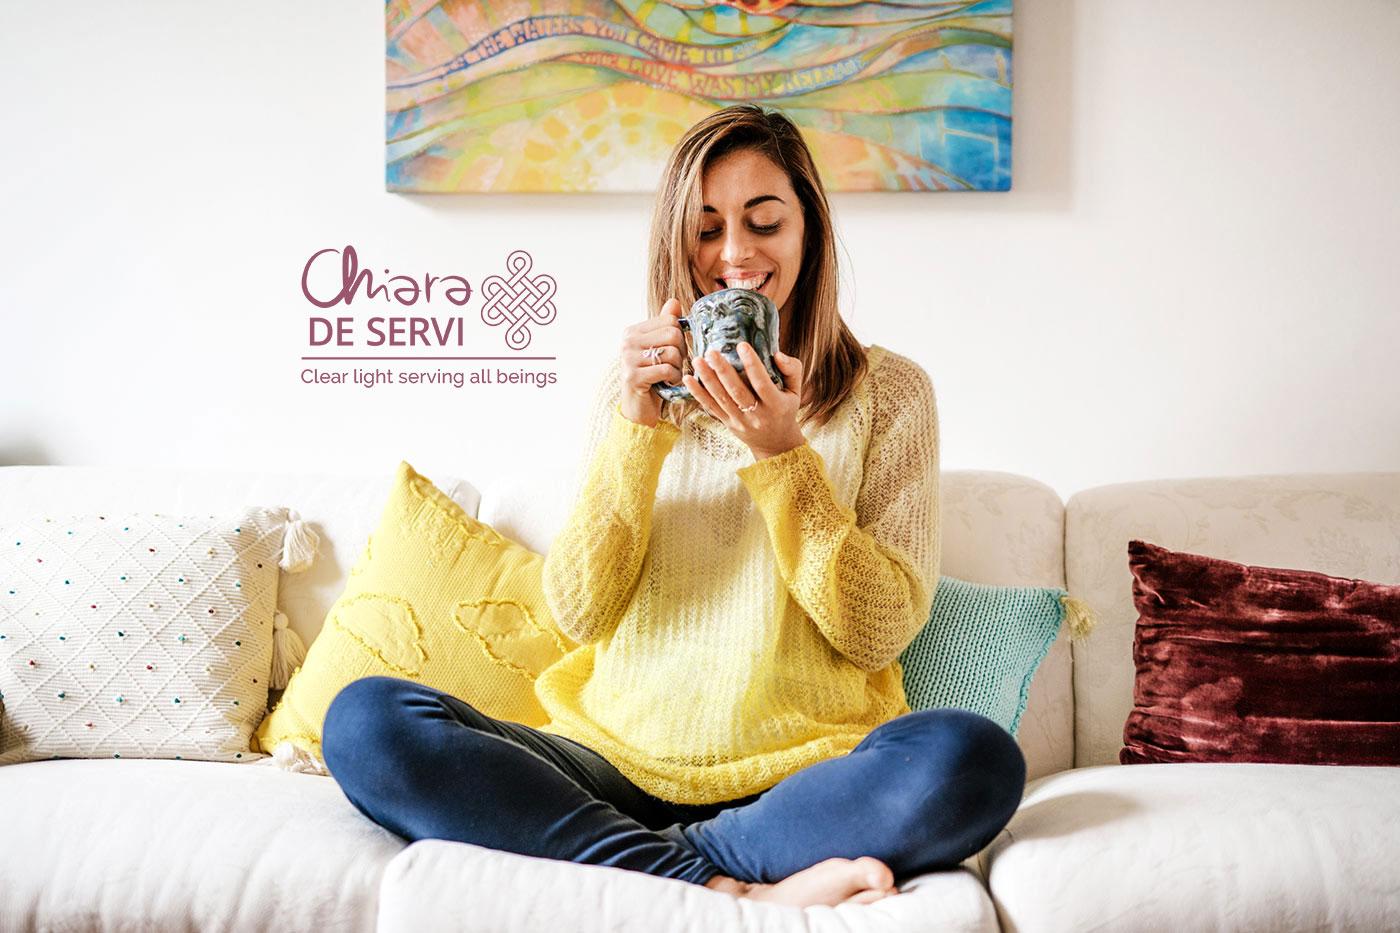 Chiara De Servi Mindfulness e Focusing